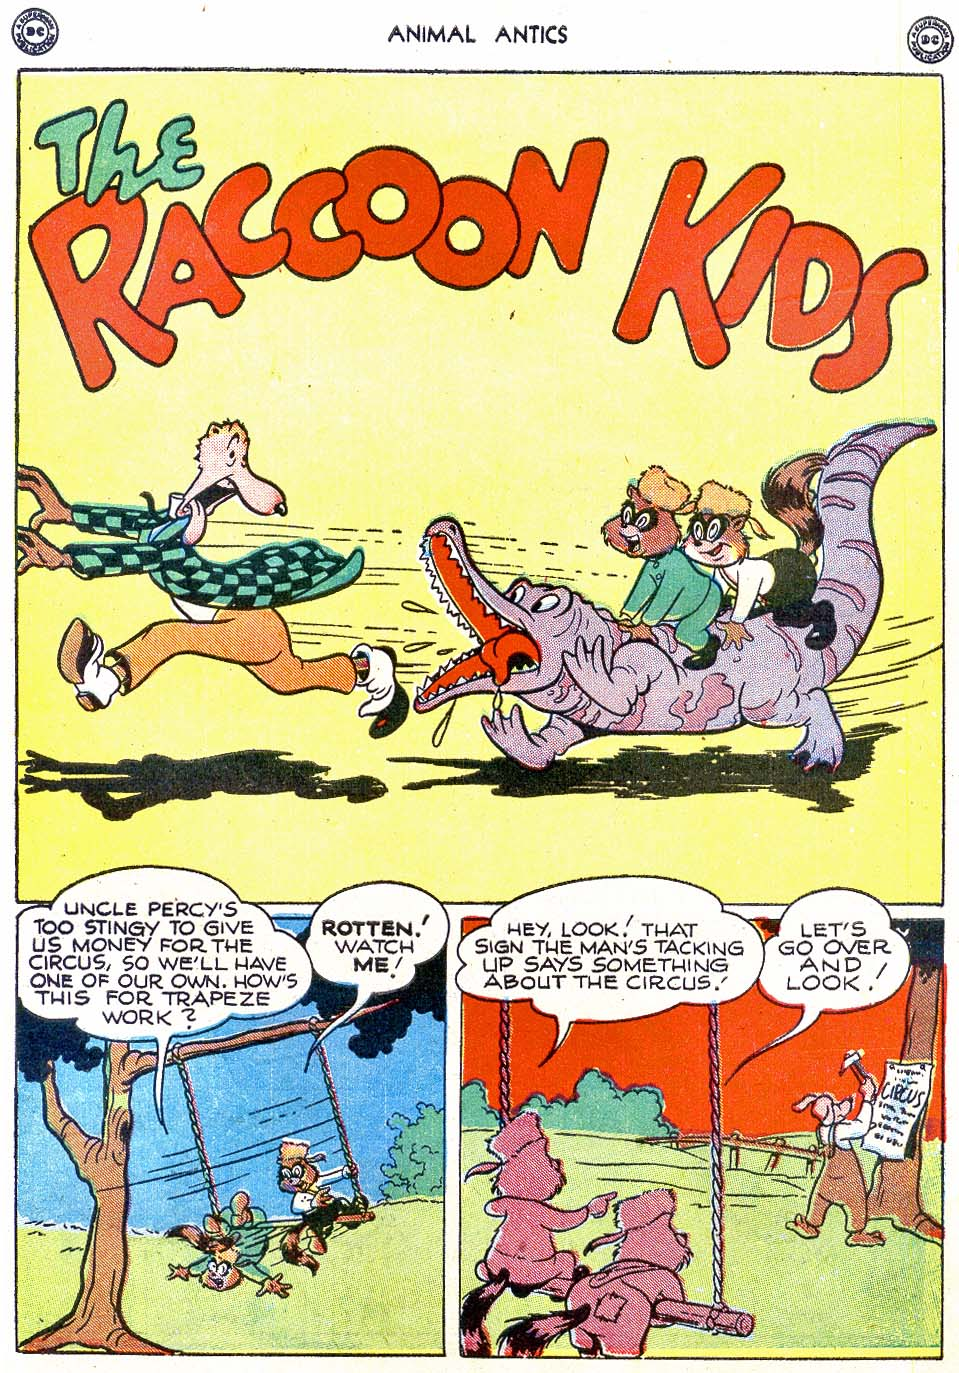 Read online Animal Antics comic -  Issue #4 - 45